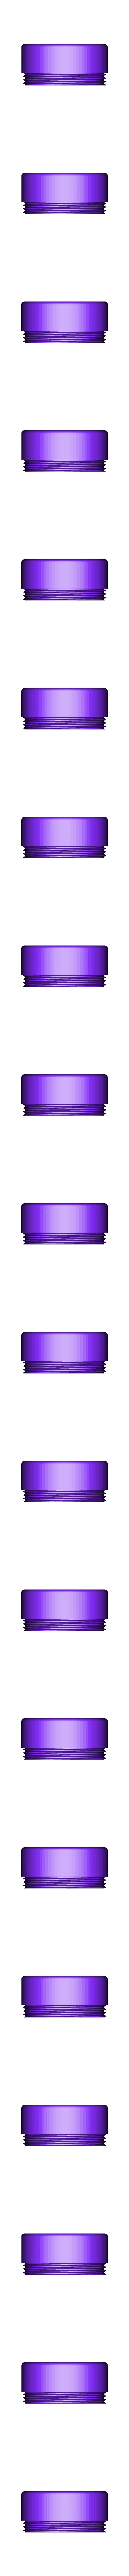 Blueprint_Carrier_Top.stl Download free STL file Blueprint Carrier • 3D printable template, DraftingJake